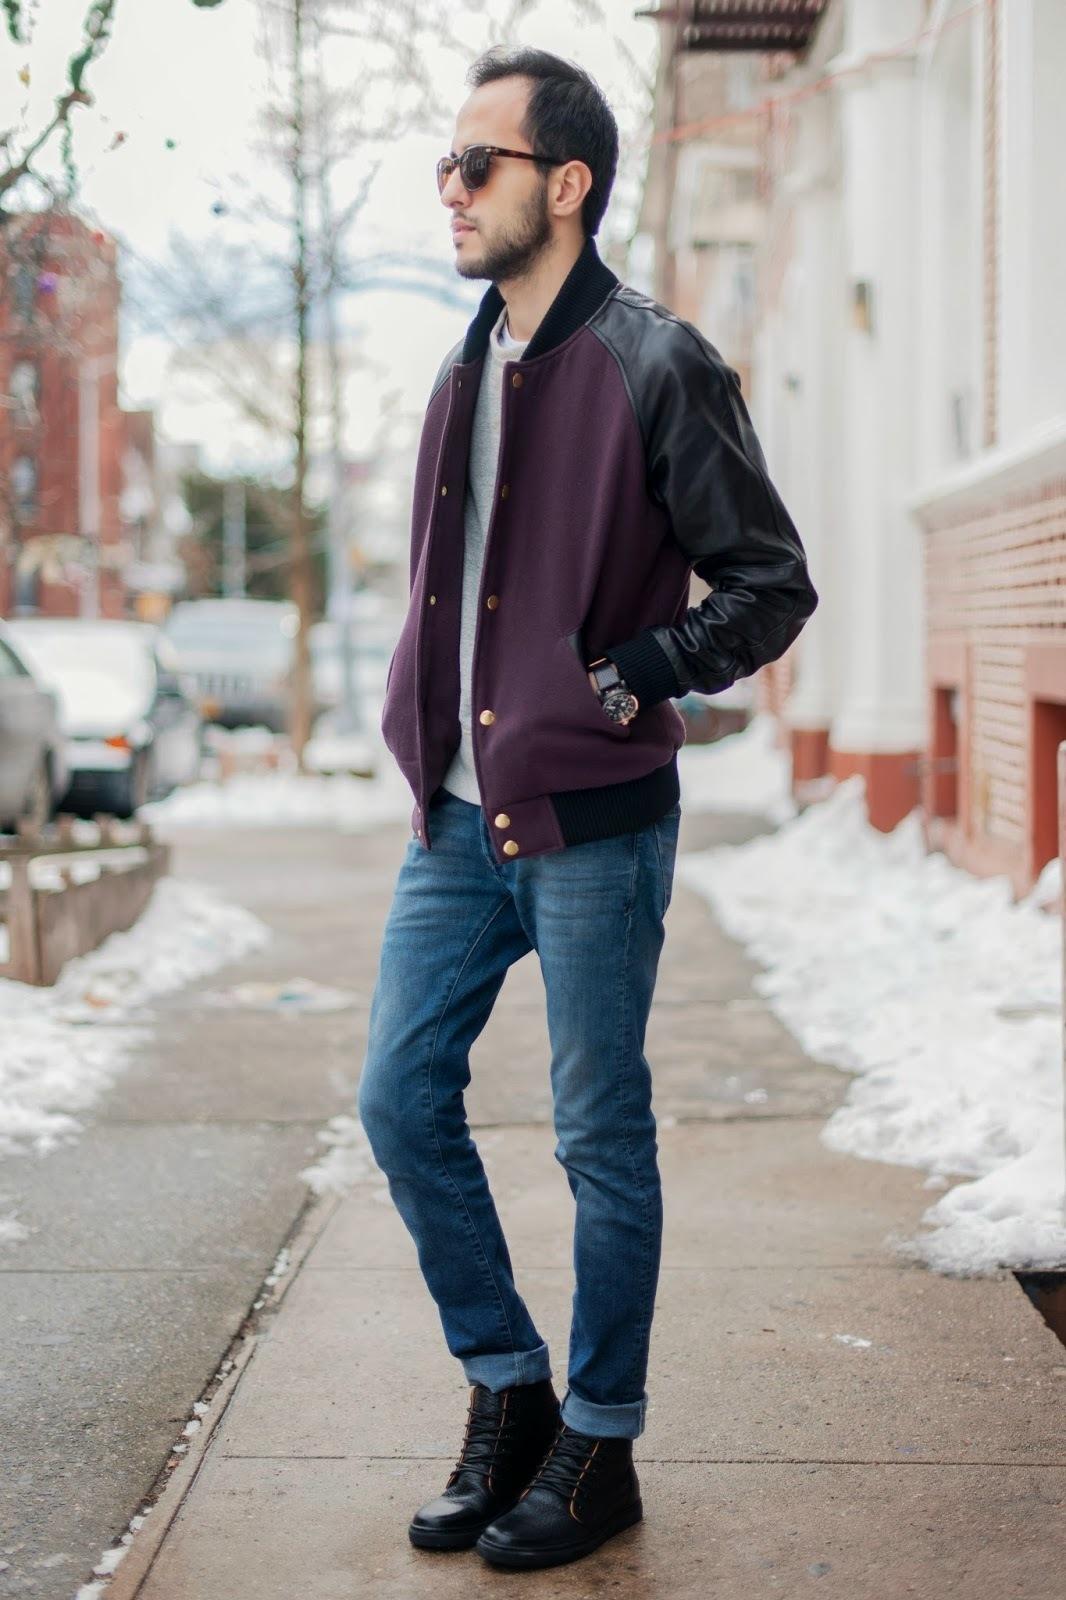 Fragrance for Men & Women Offers & Gift Sets - Boots Black boots men fashion